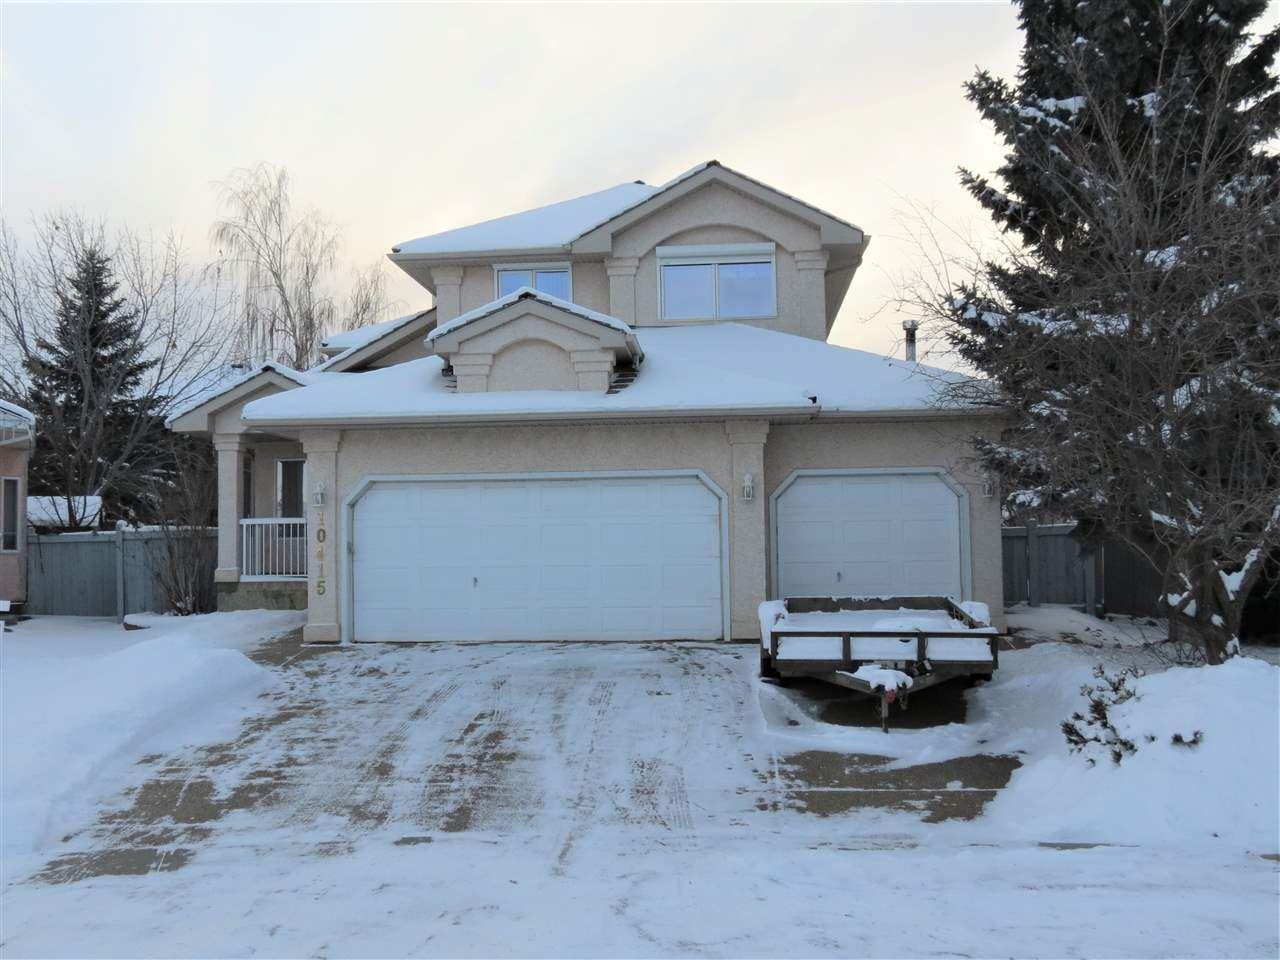 Main Photo: 10415 175 Avenue in Edmonton: Zone 27 House for sale : MLS®# E4139479